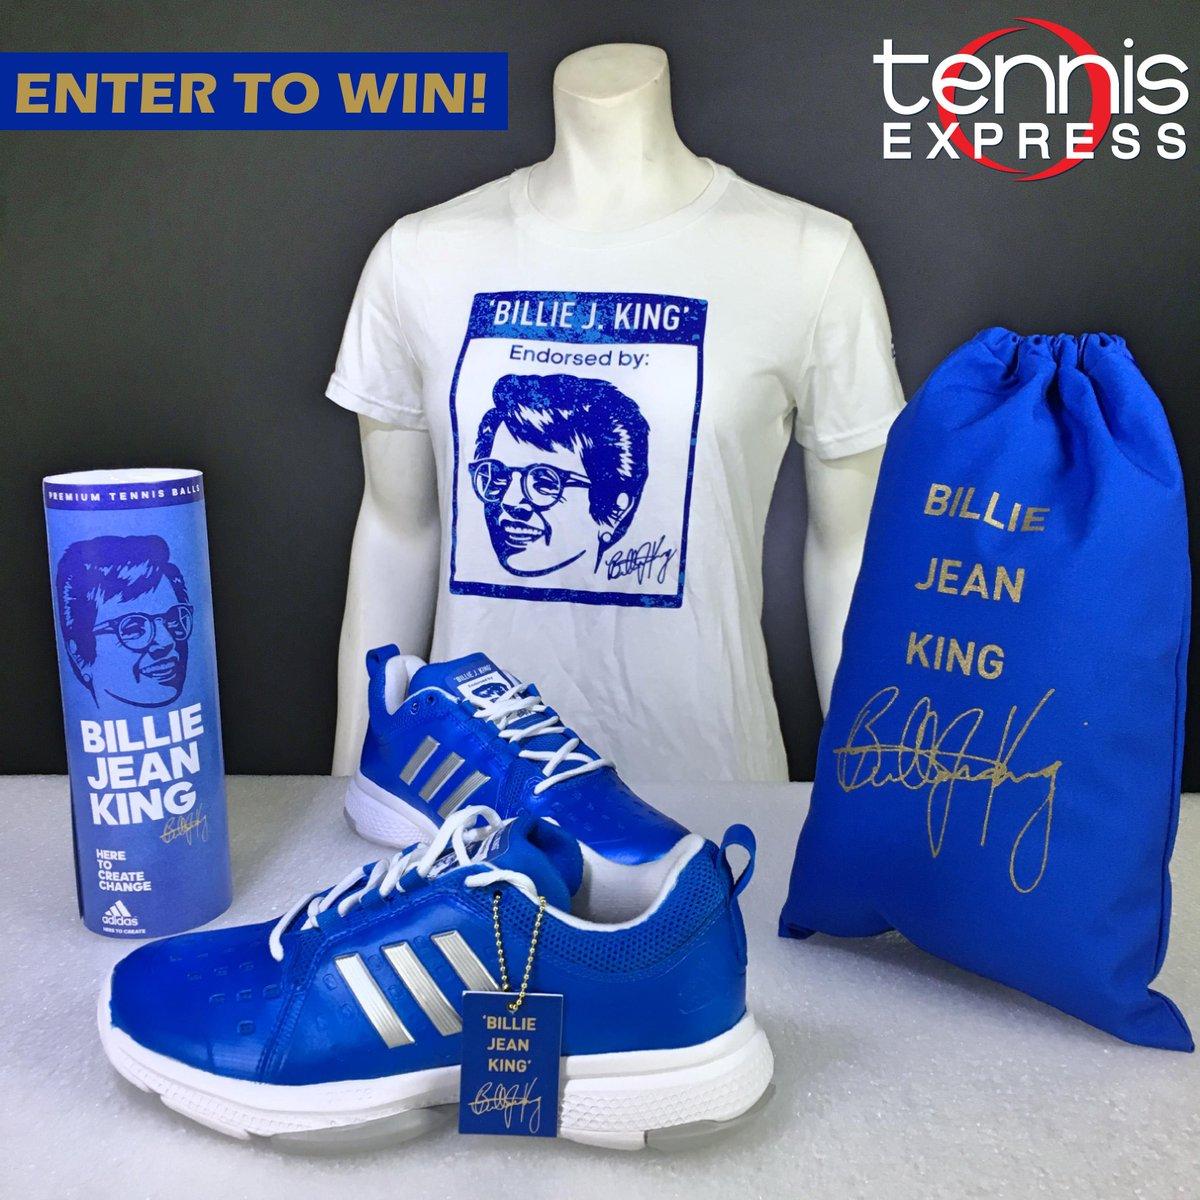 billie jean king adidas shirt